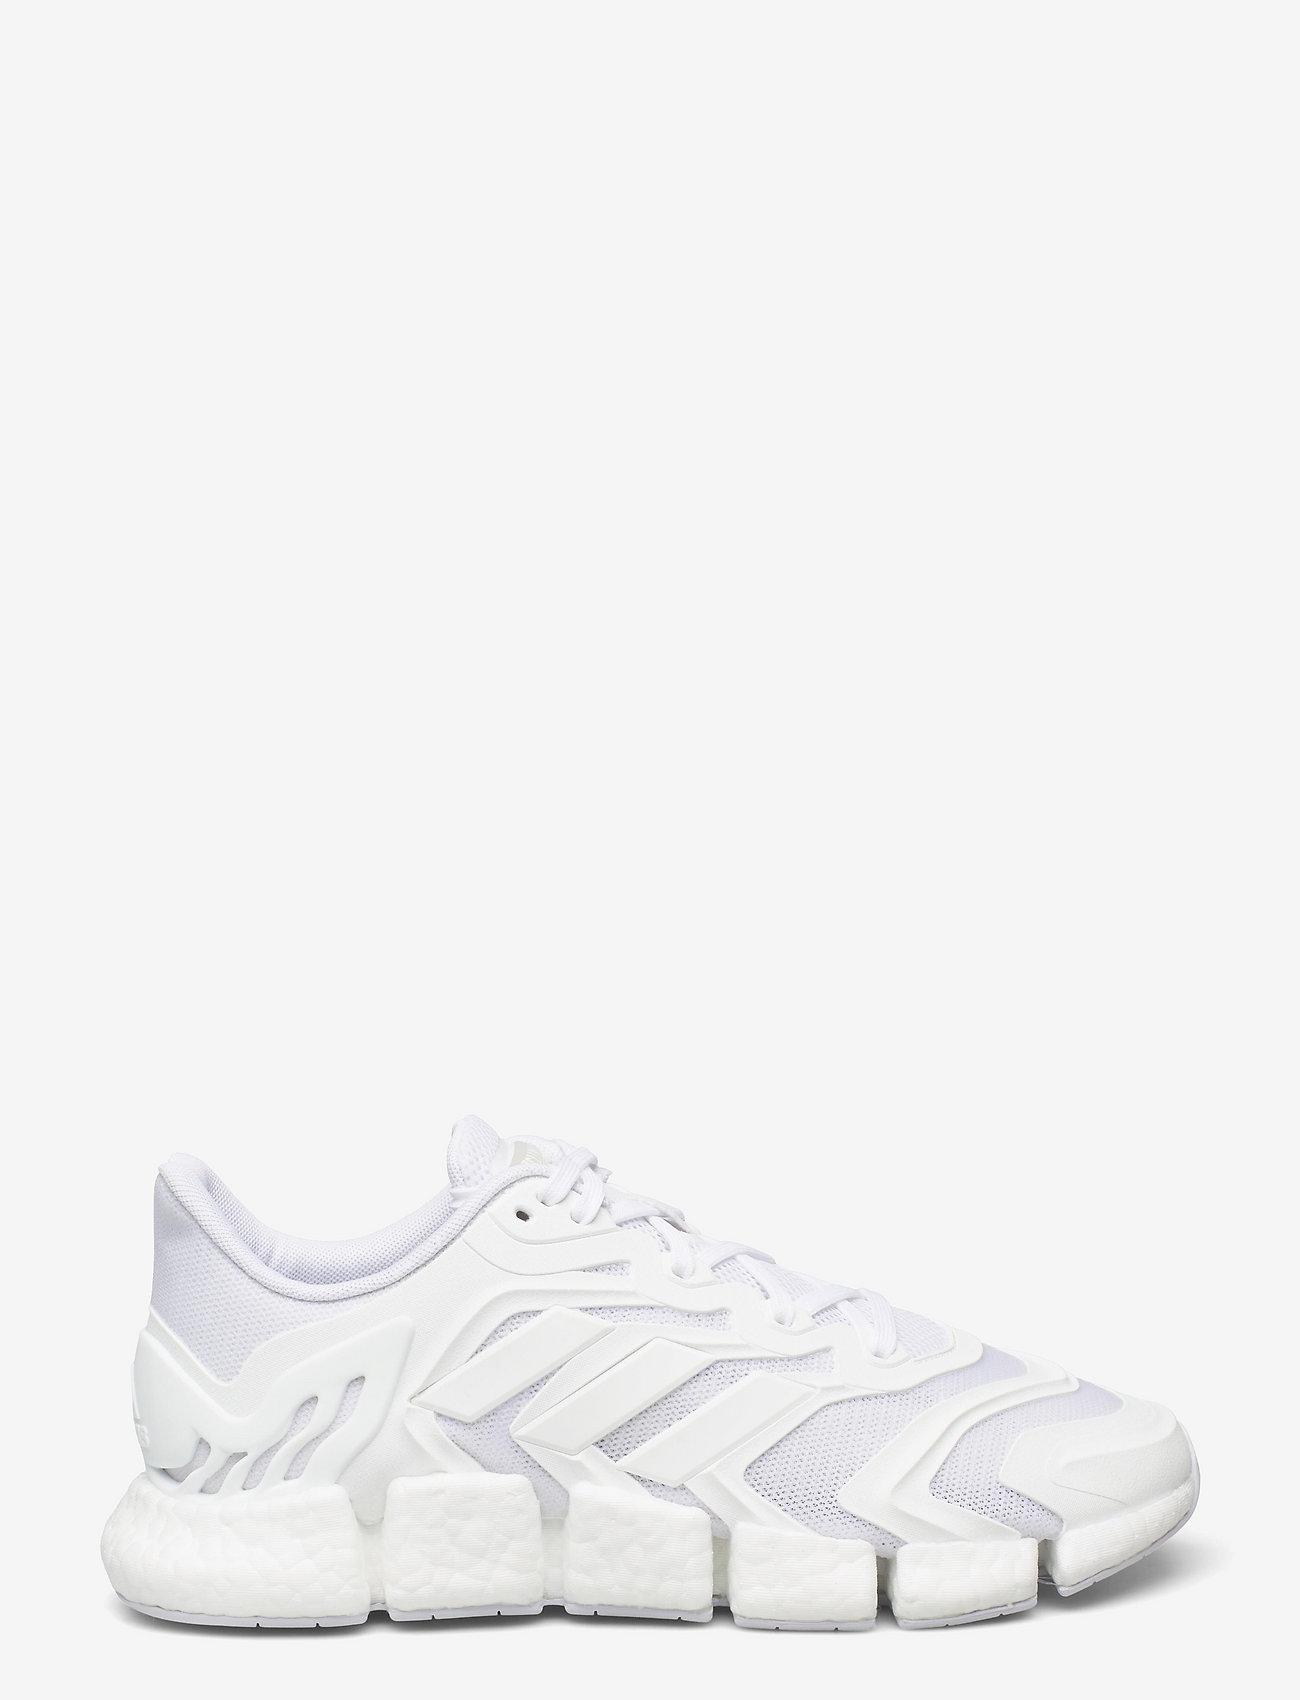 adidas Performance - Climacool Vento - löbesko - ftwwht/ftwwht/ftwwht - 1